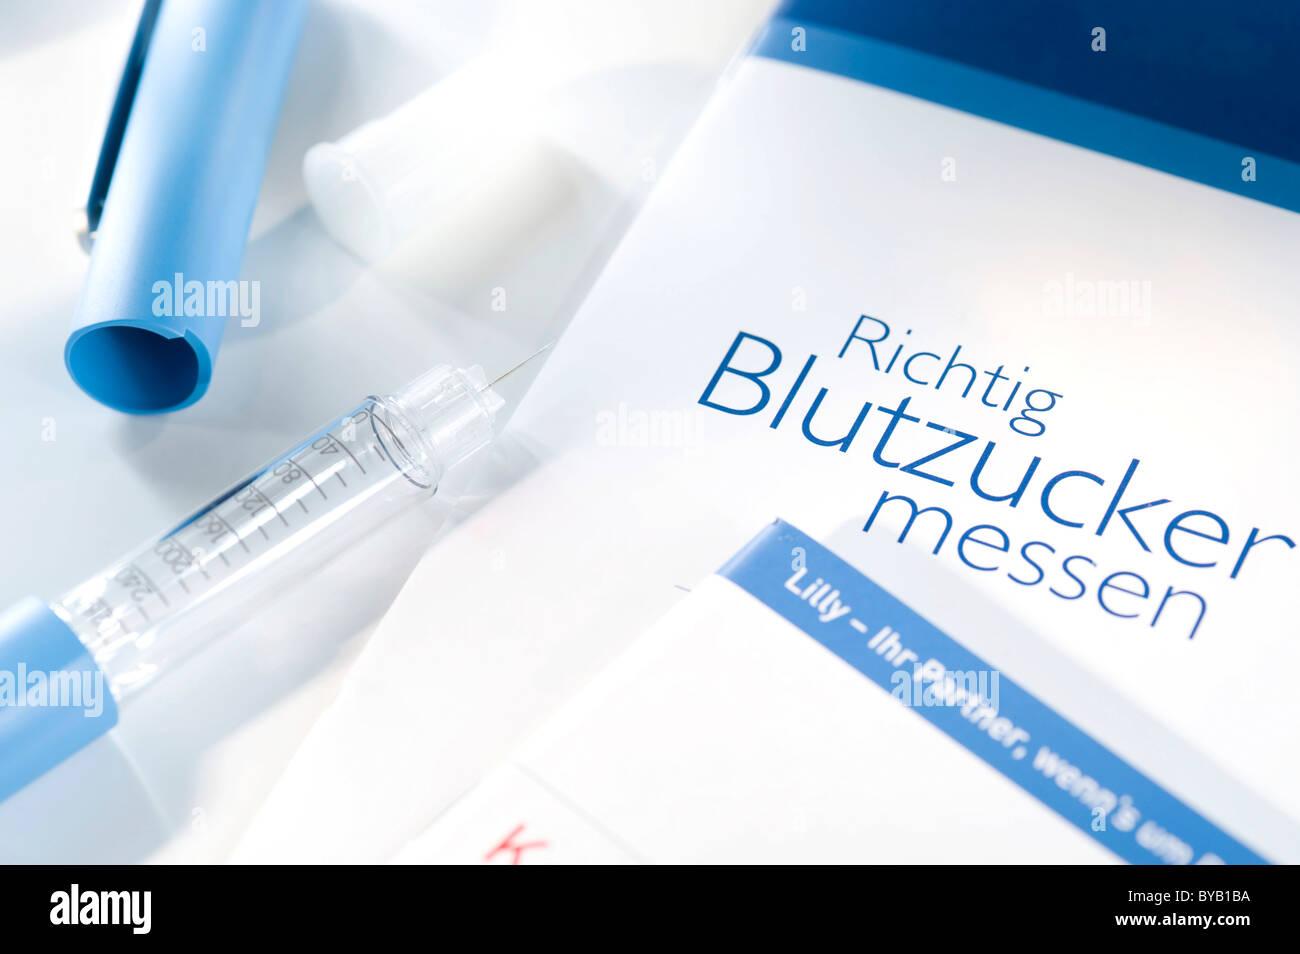 Blood glucose monitoring - Stock Image